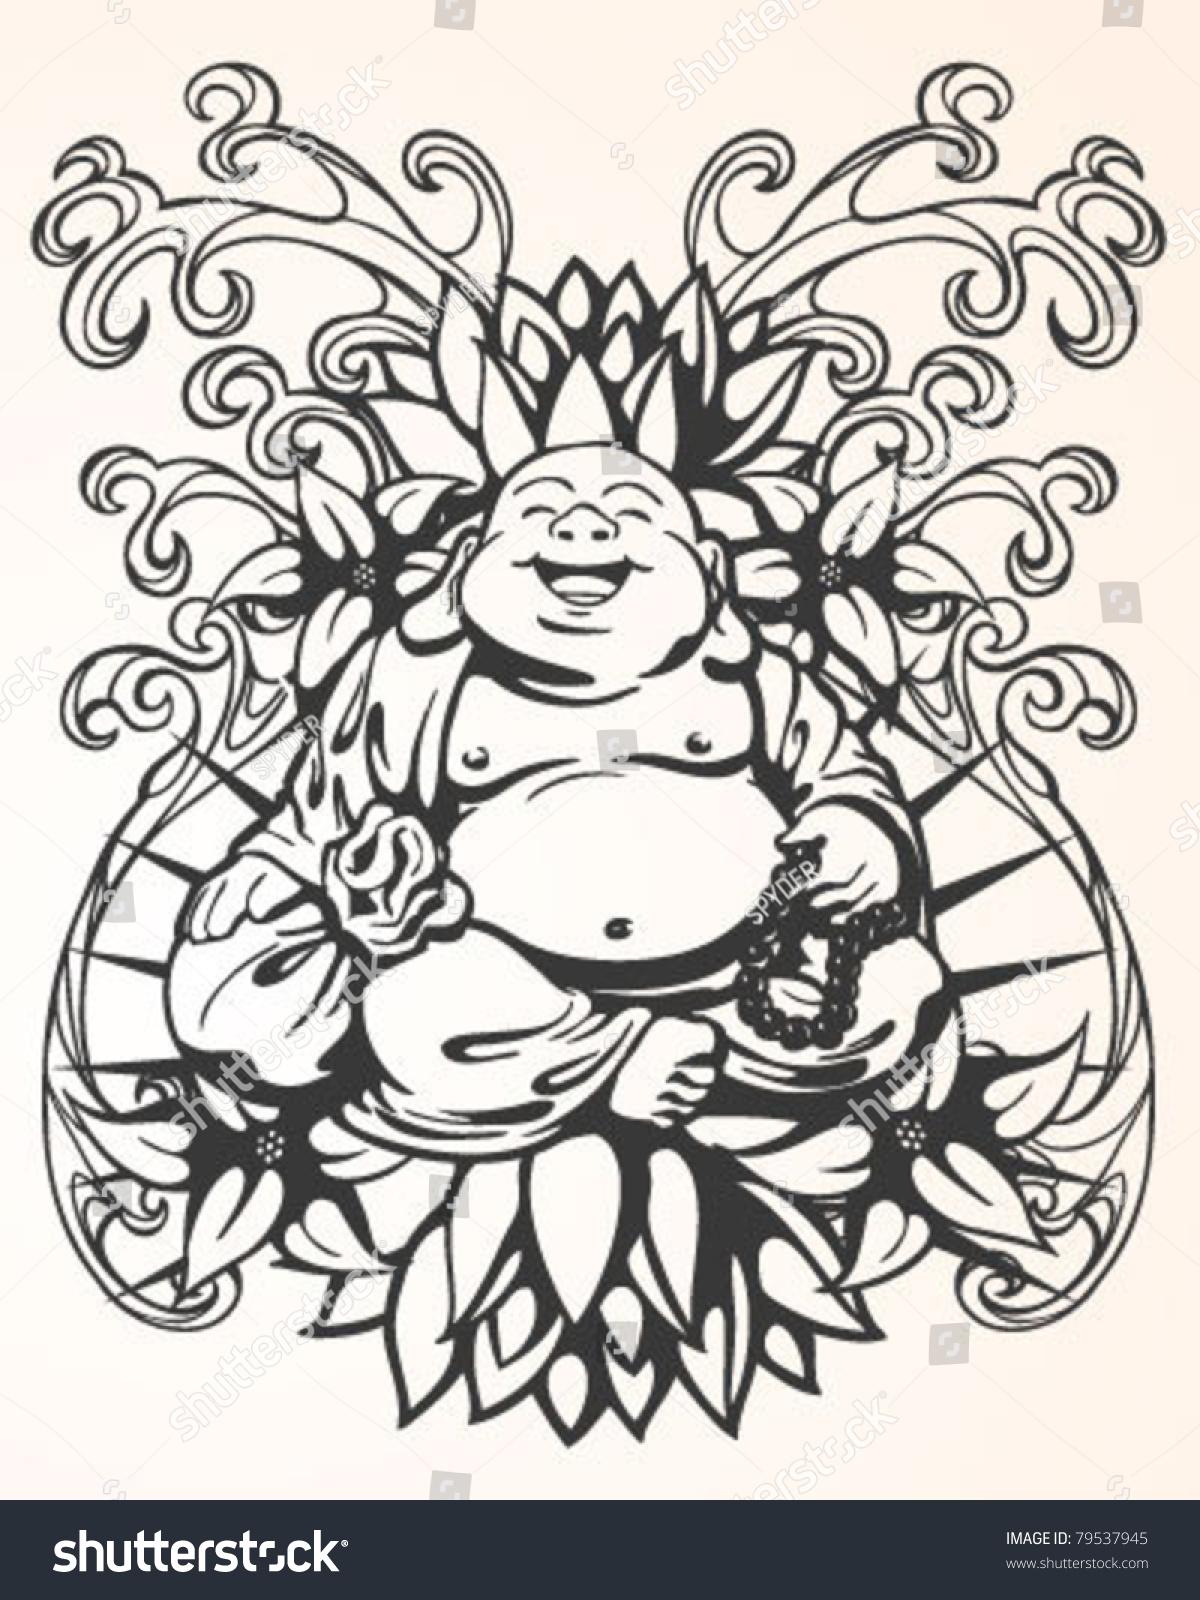 Tattoo Buddha Design Stock Vector 79537945 - Shutterstock